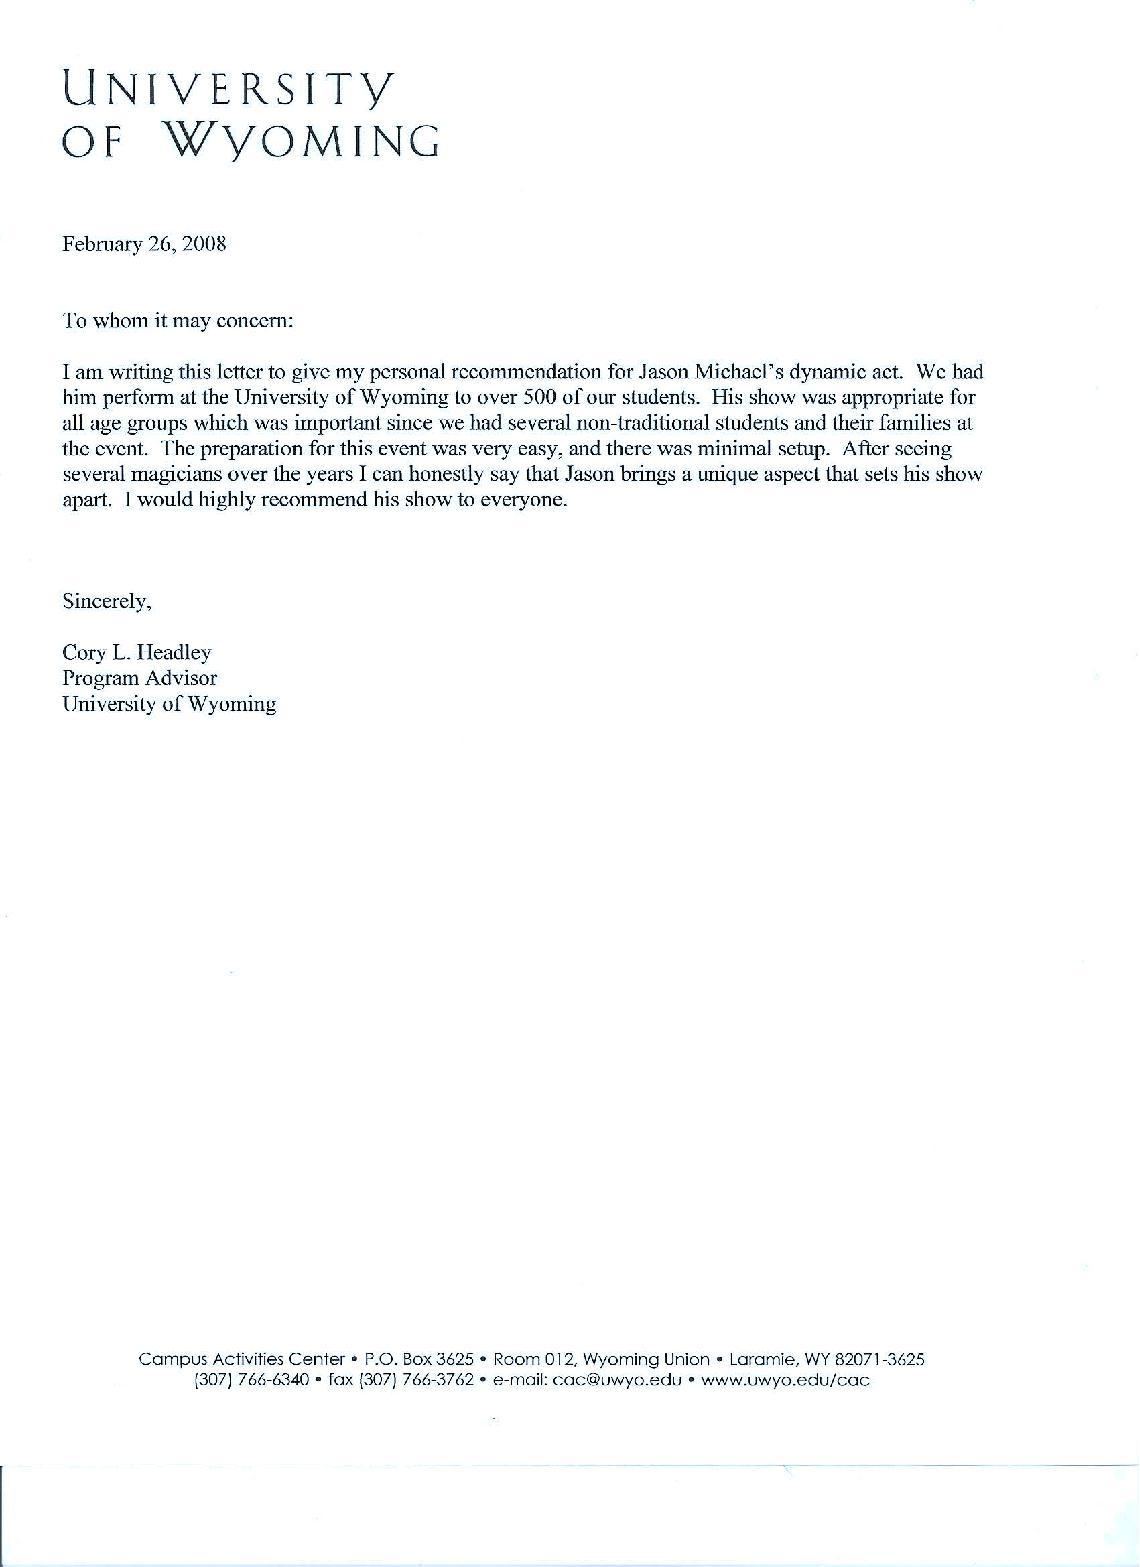 University of Wyoming-page-001.jpg